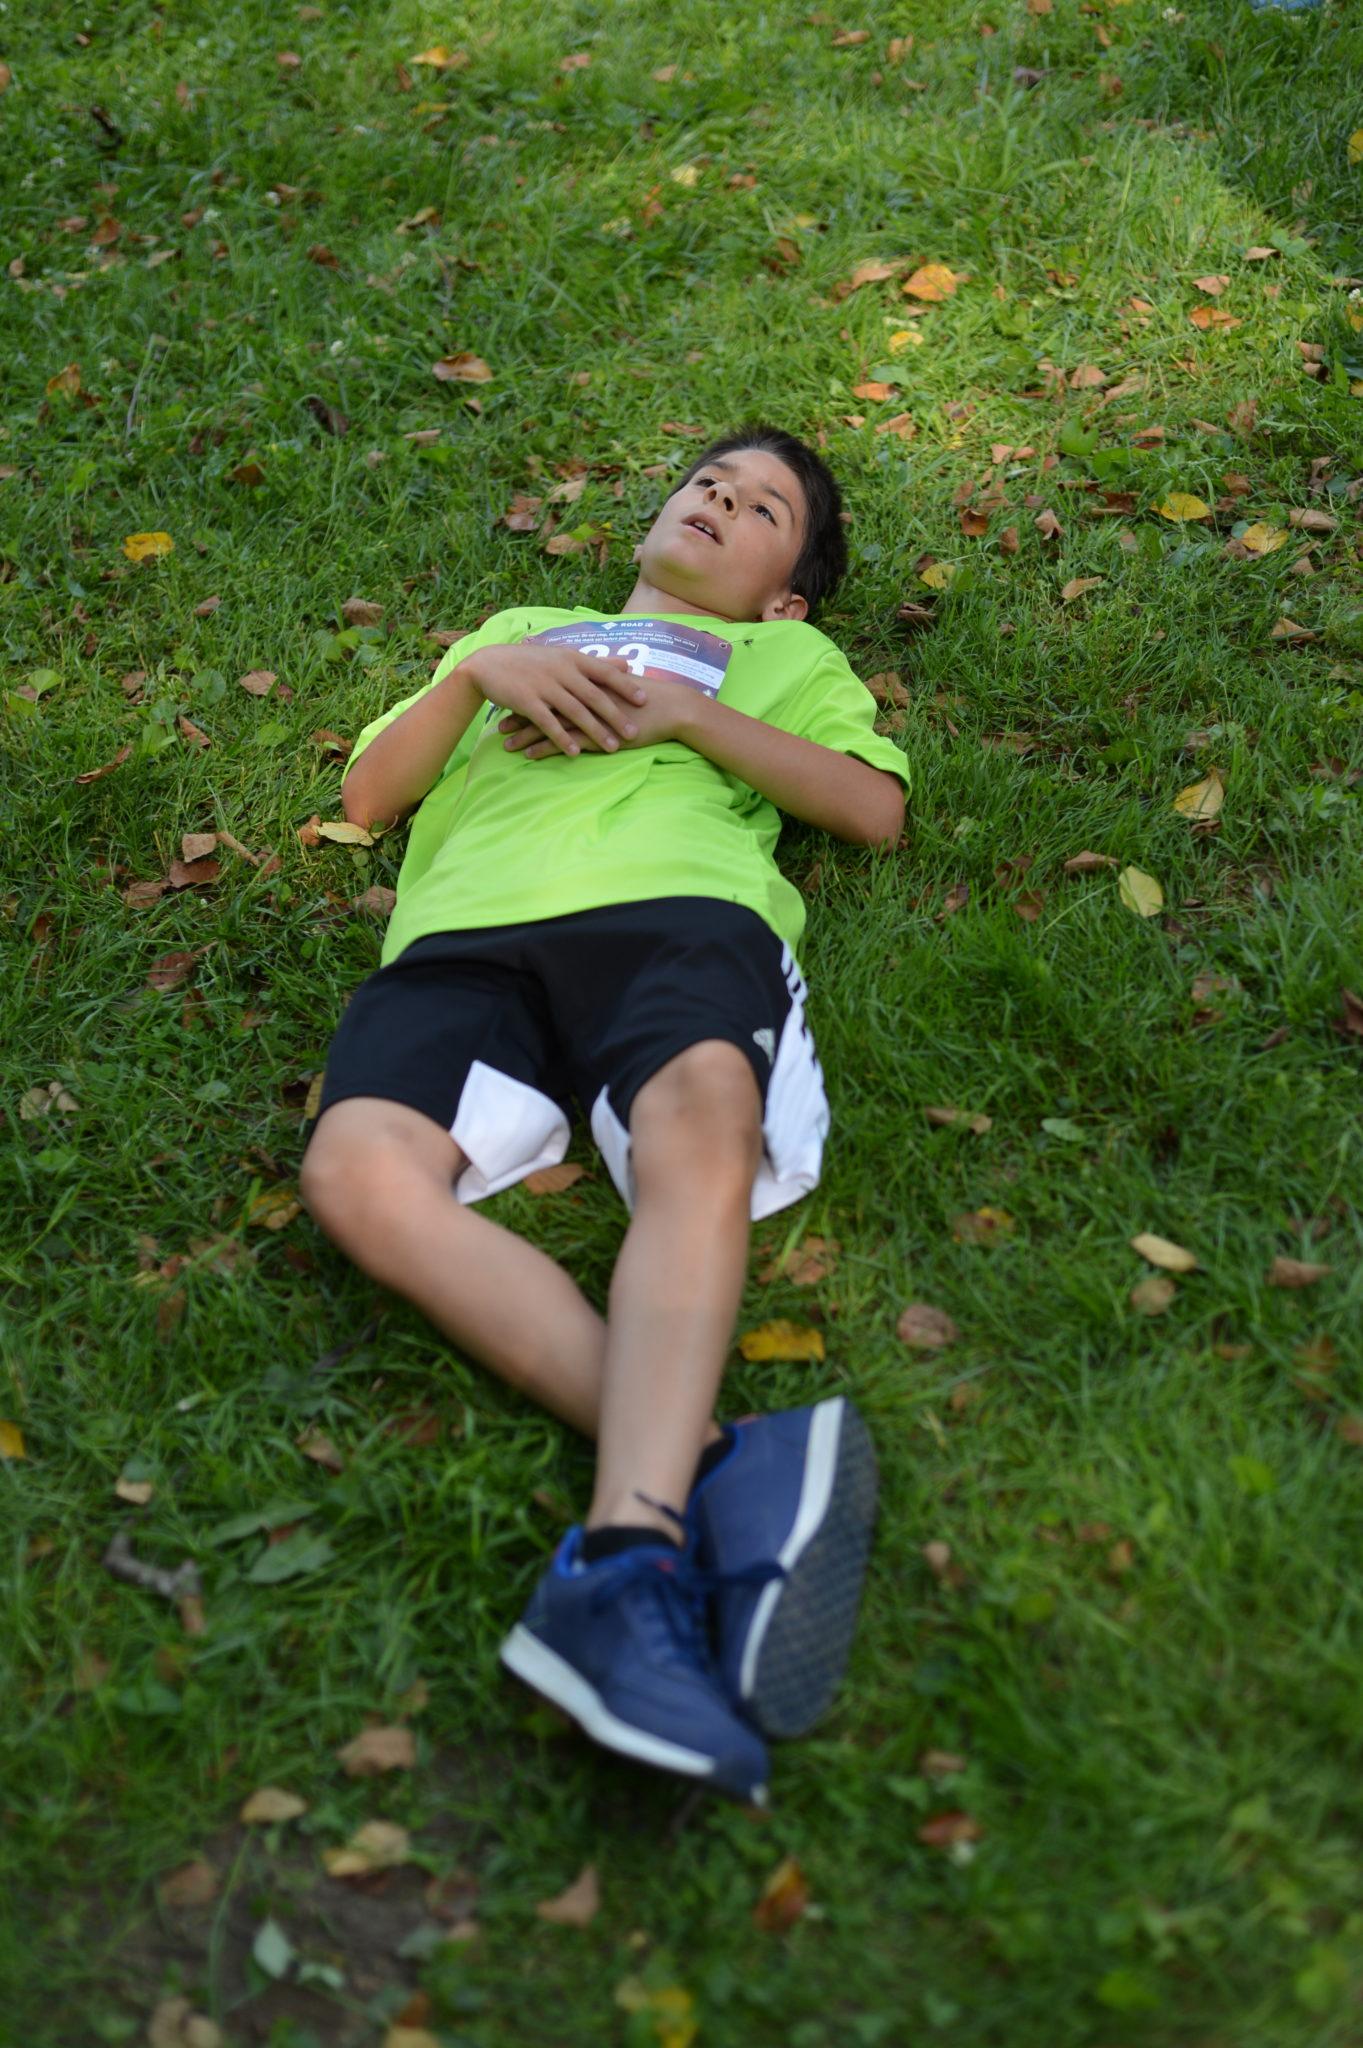 LMR Boy Resting